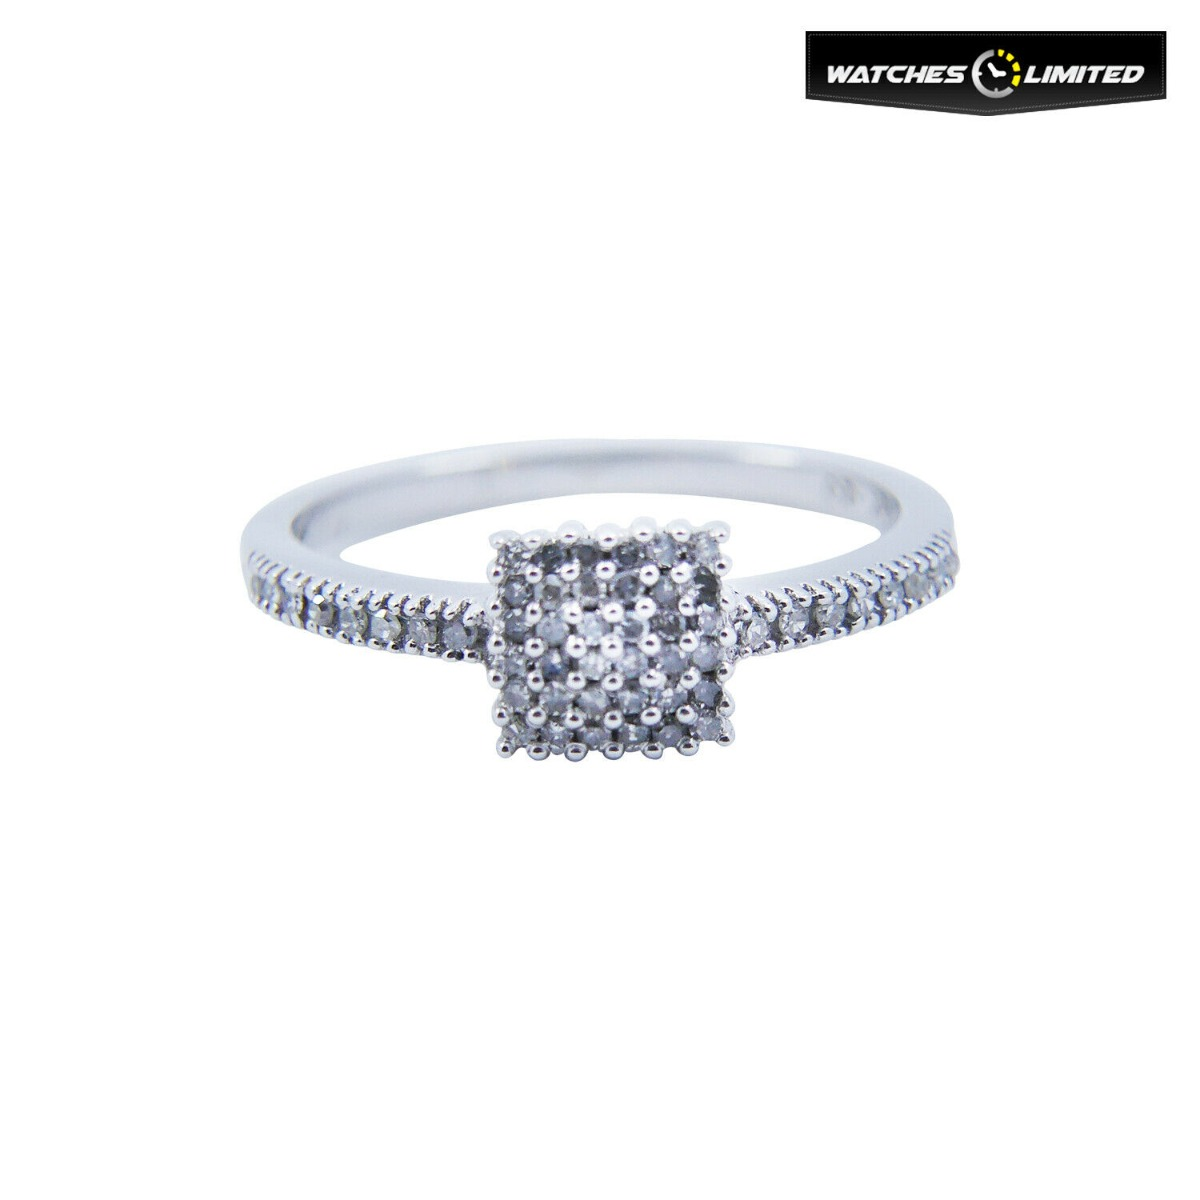 Ladies 9ct White Gold 0.20ct Diamond Ring Square Shape Size N